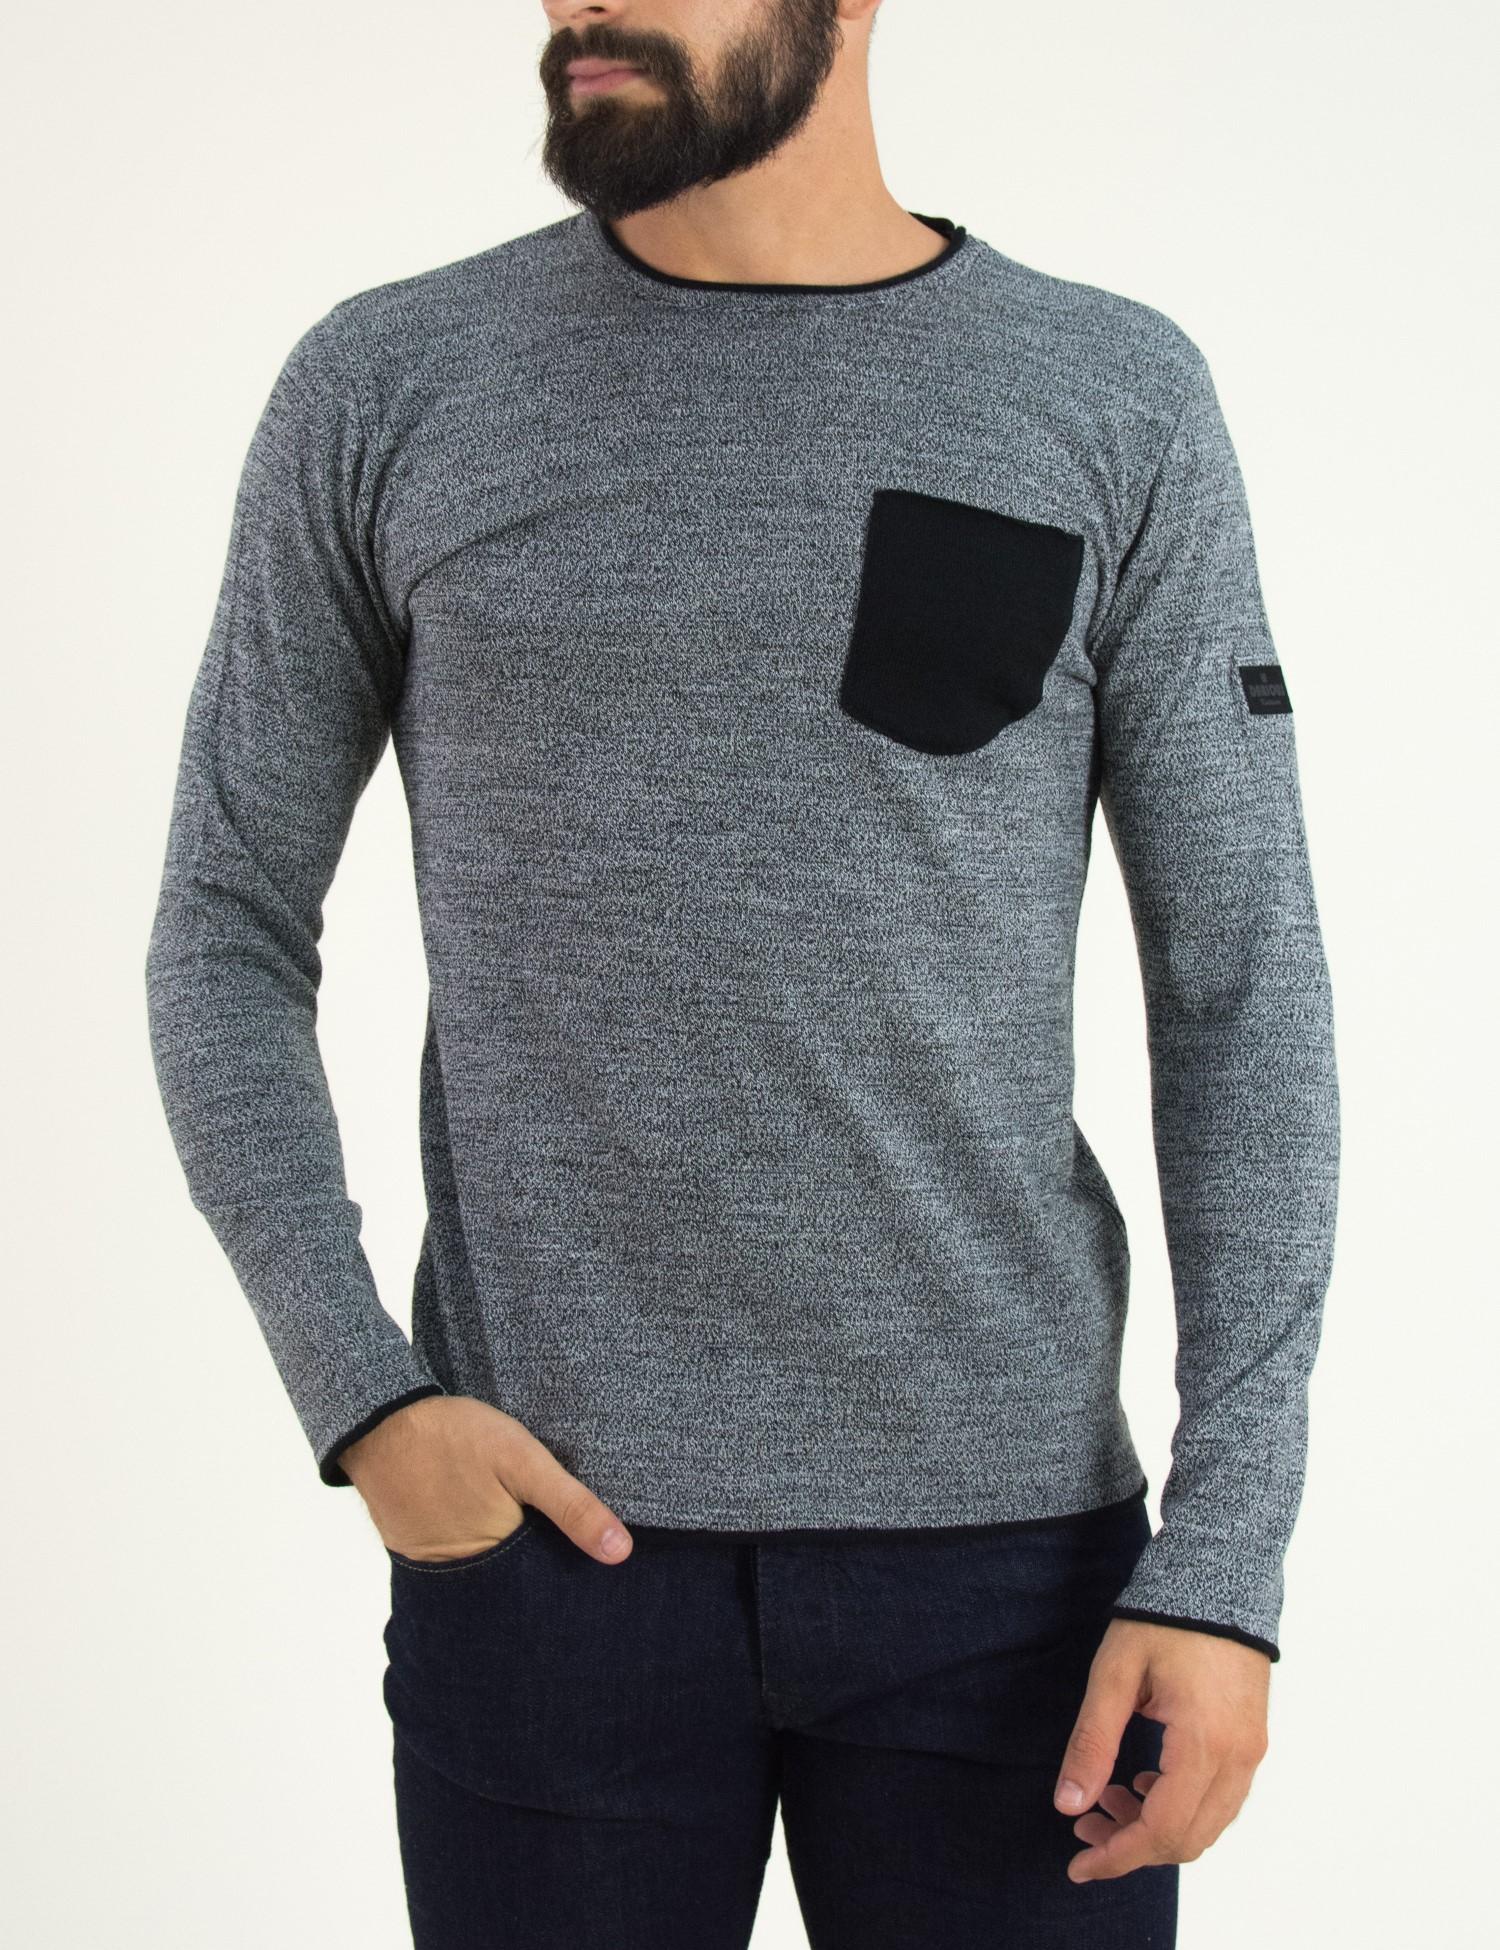 6c2744552054 Ανδρική πλεκτή μπλούζα Darious γκρι με τσεπάκι 1721Q